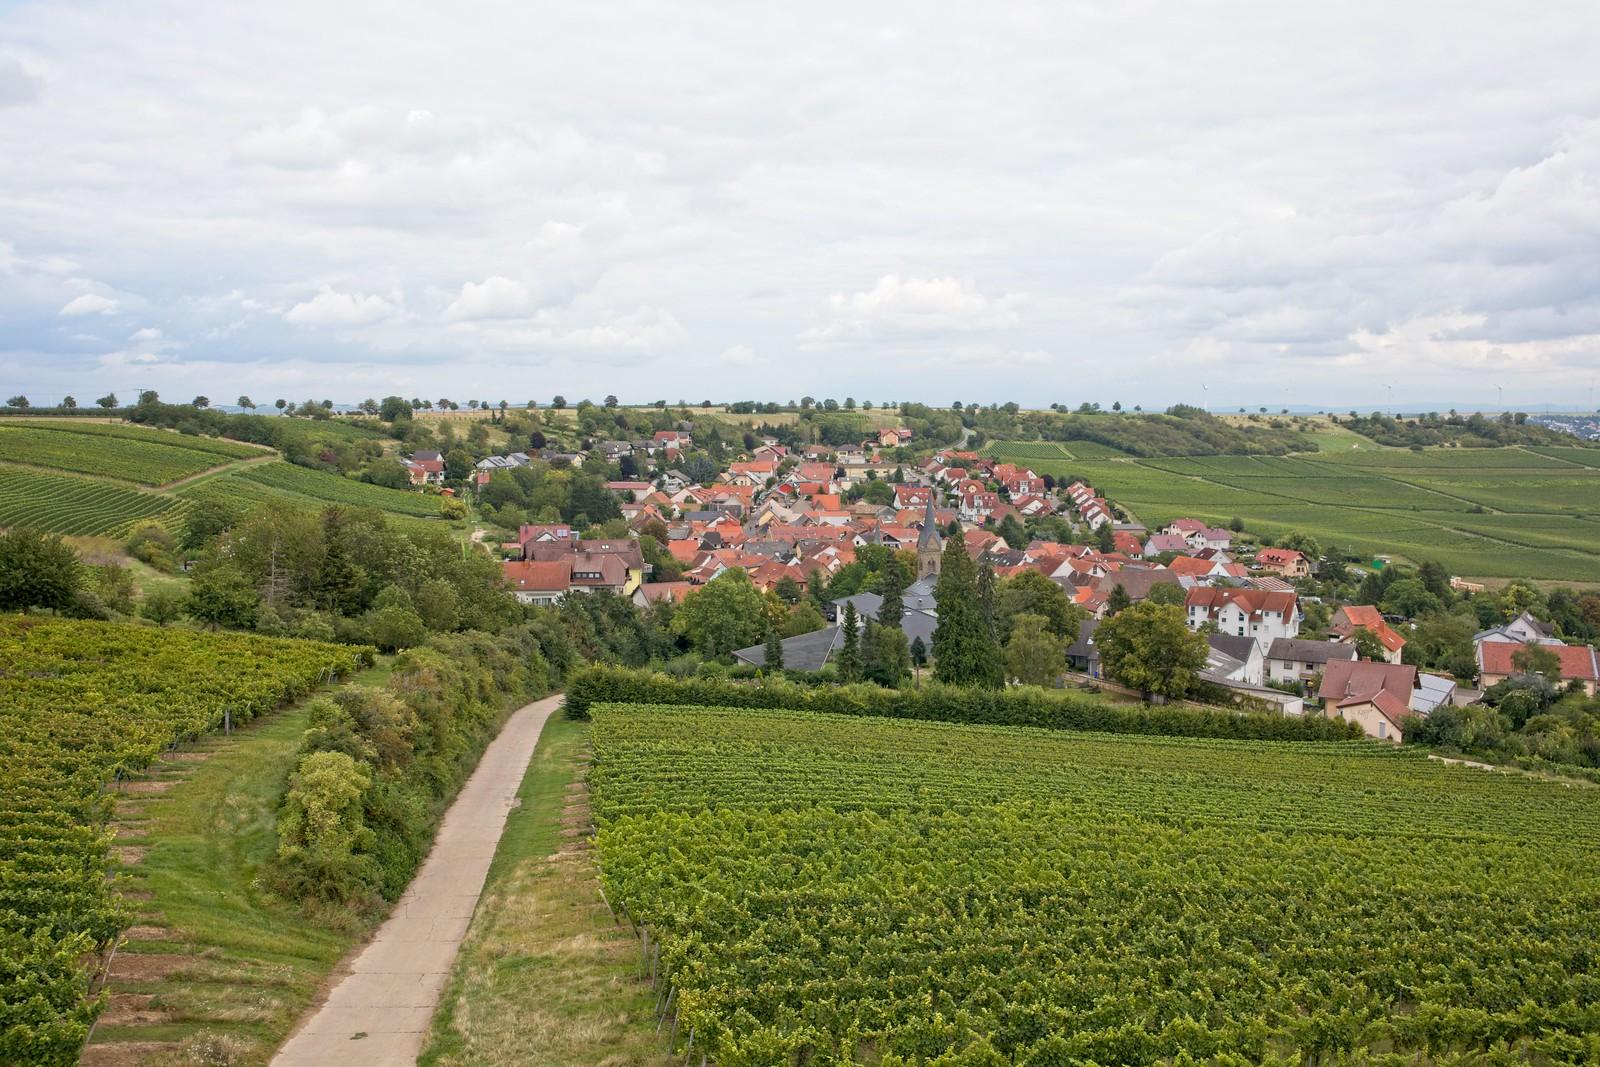 Blick auf Vendersheim vom Vendersheimer Turm